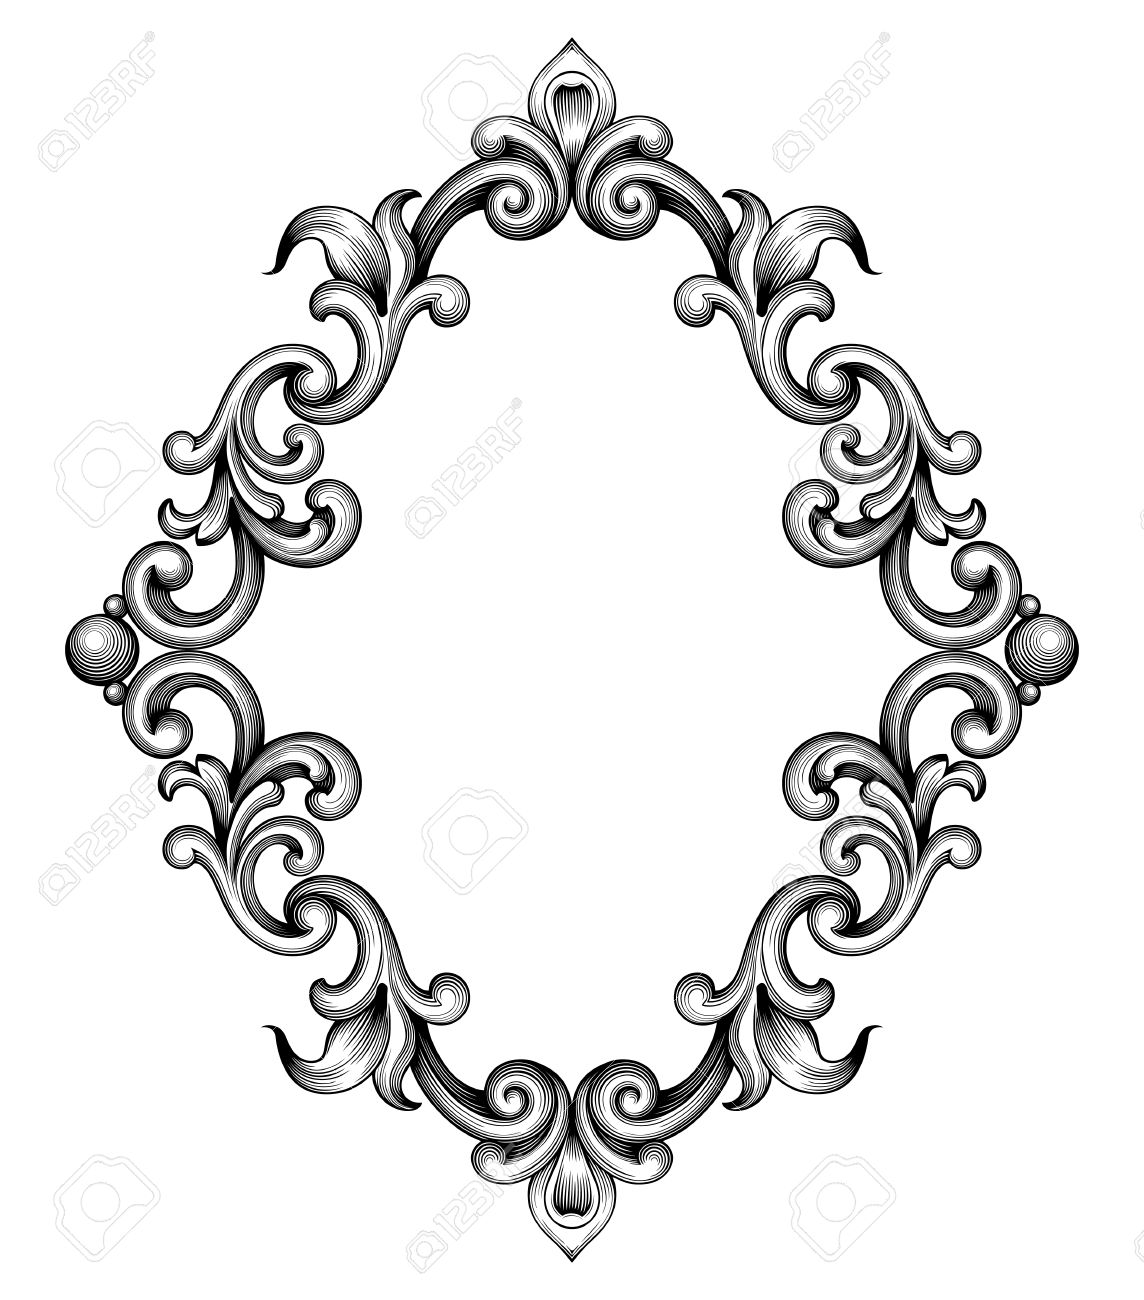 1144x1300 Ornamental Clipart Filigree Border